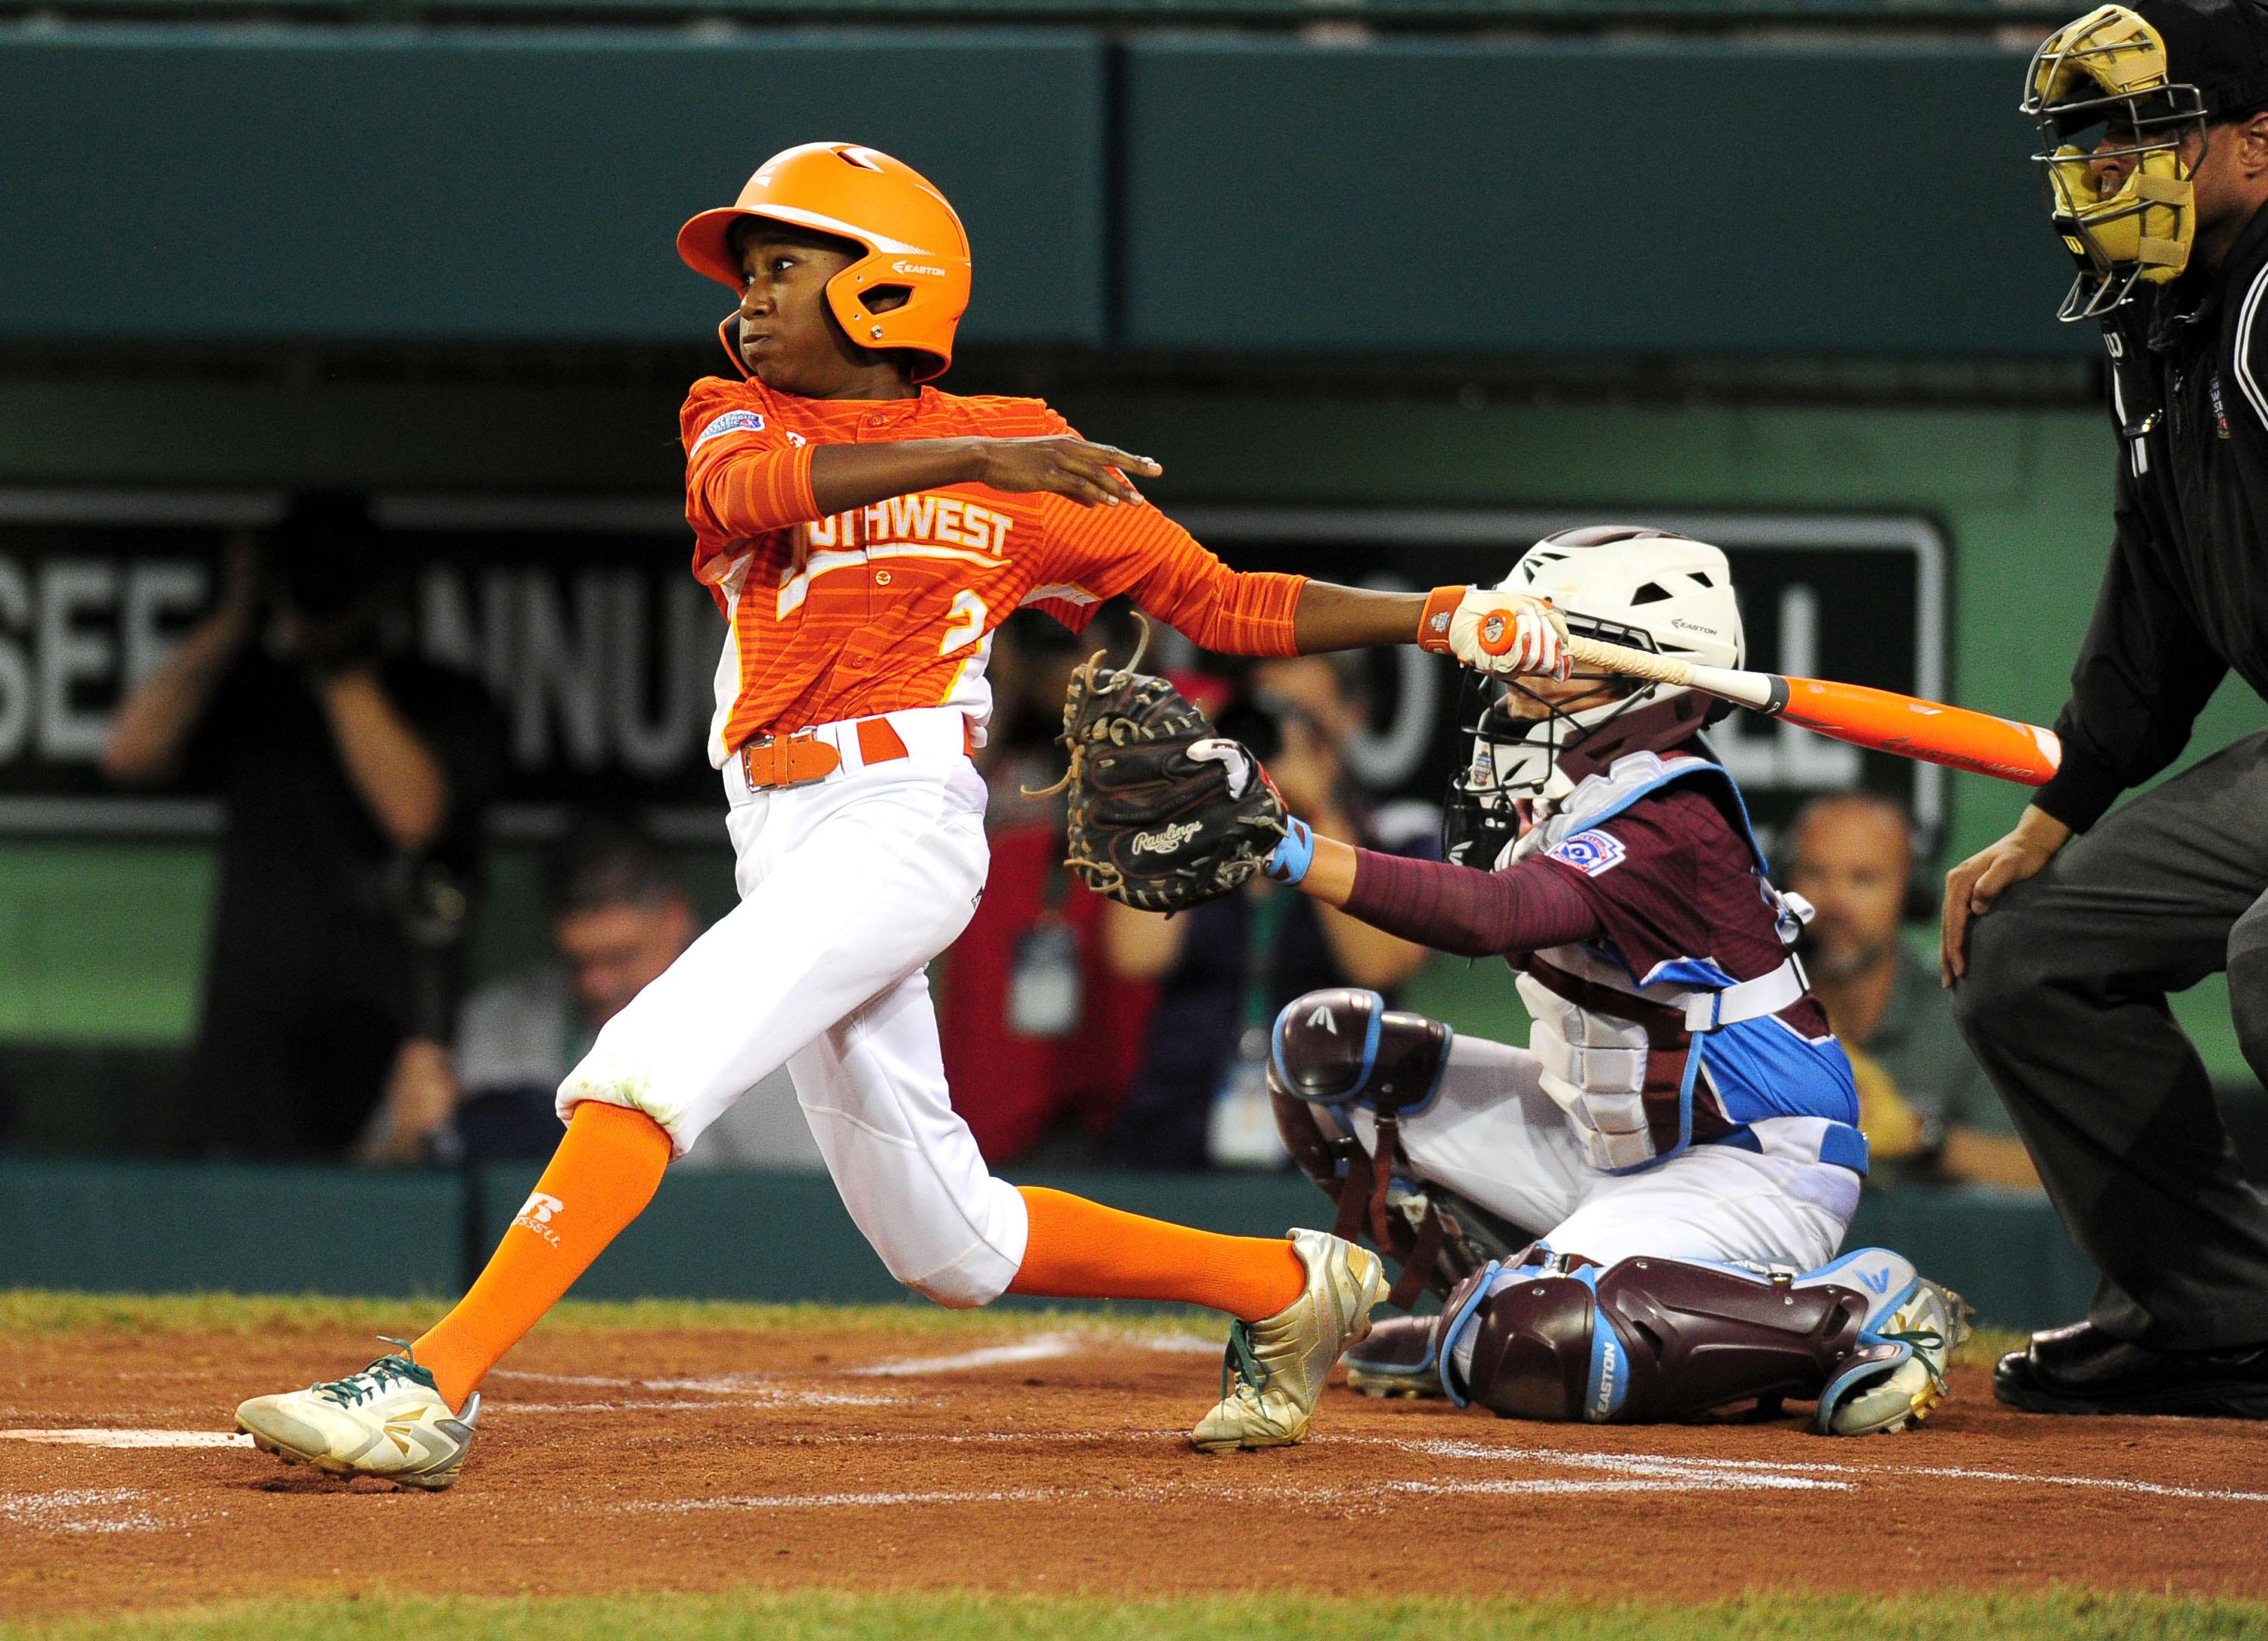 Baseball: Little League World Series-New England Region vs Southwest Region